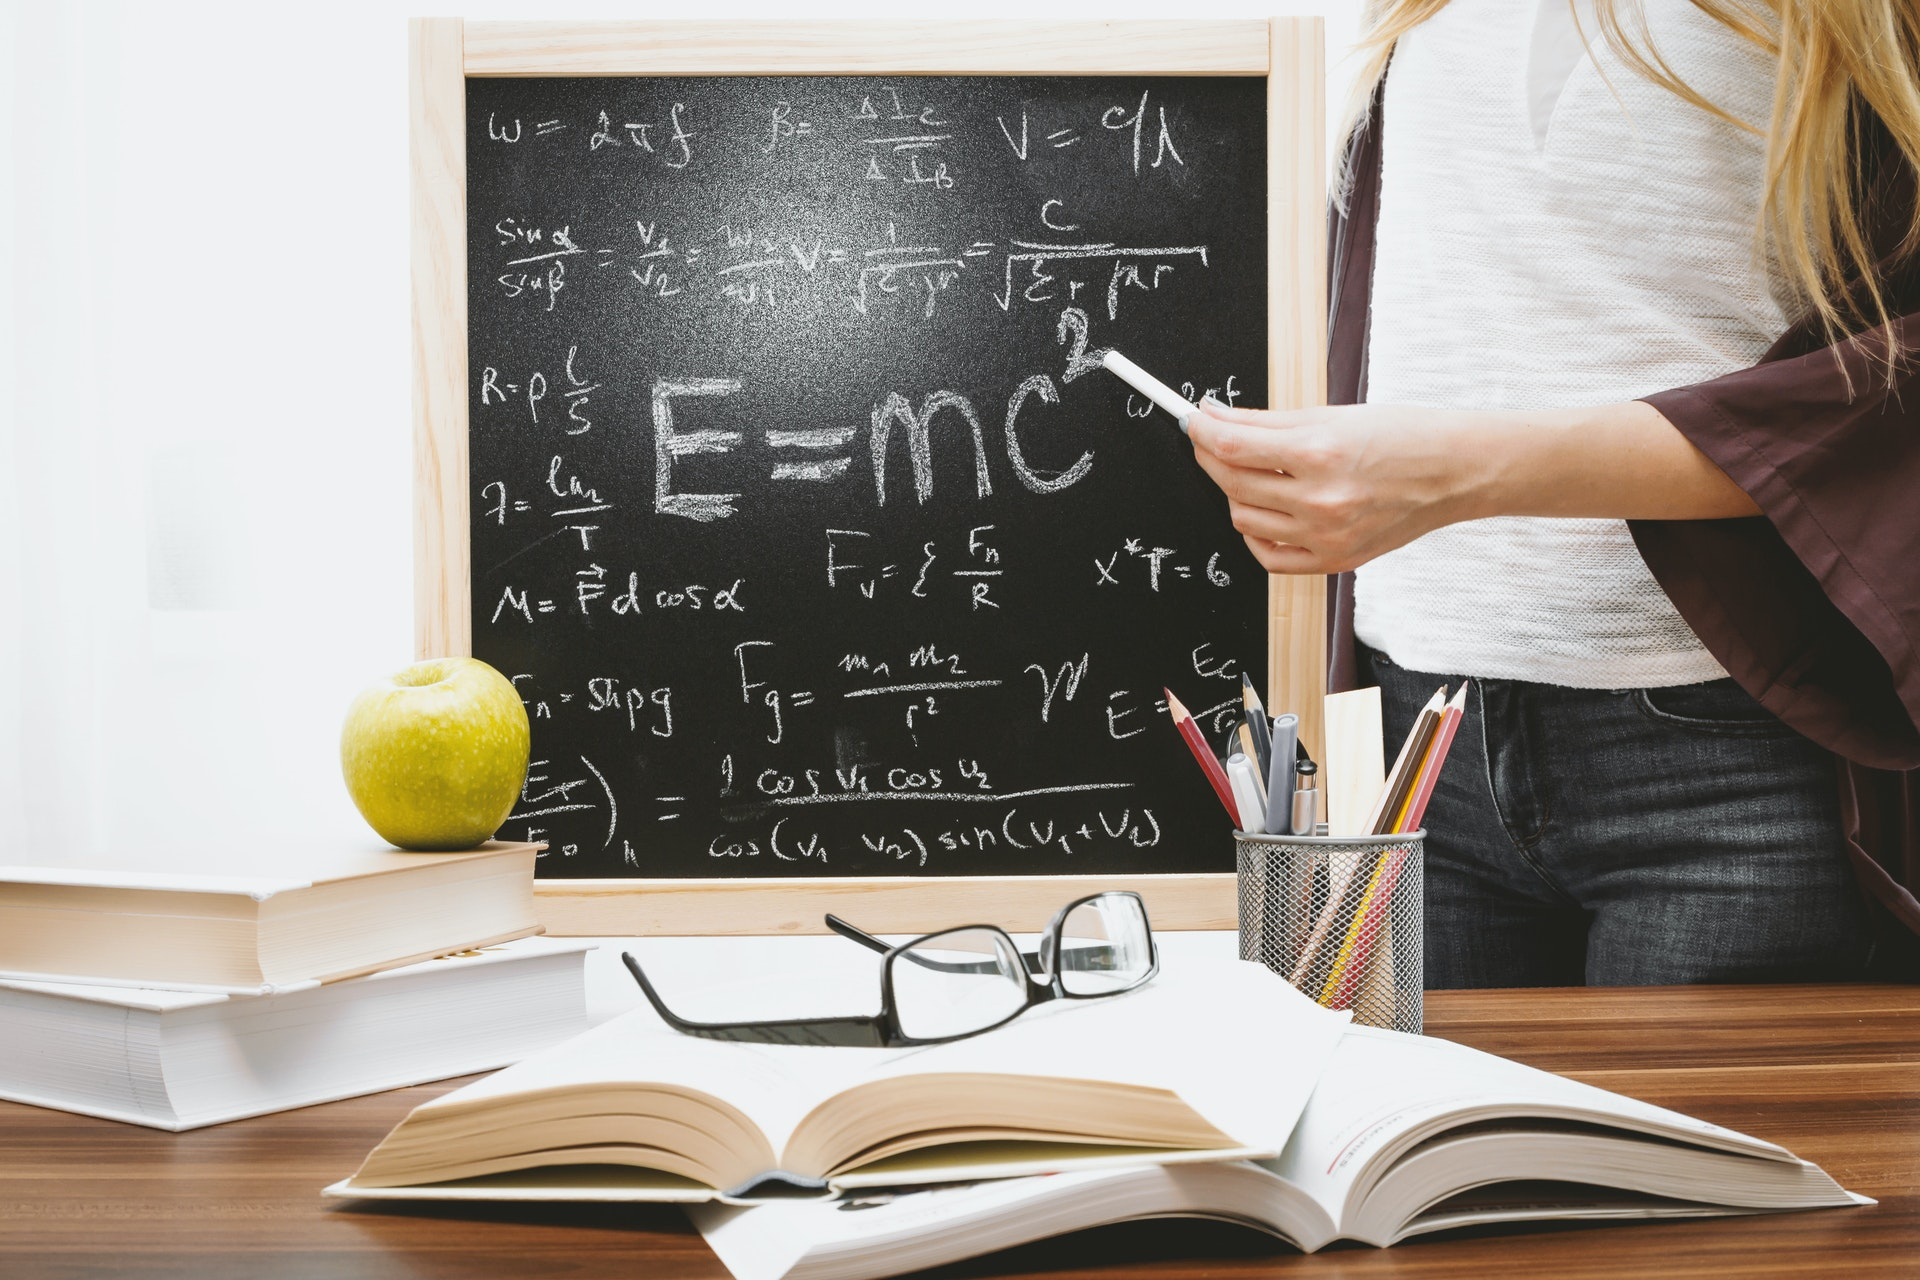 Recent Scholarships in Switzerland for 2020 Apply Now